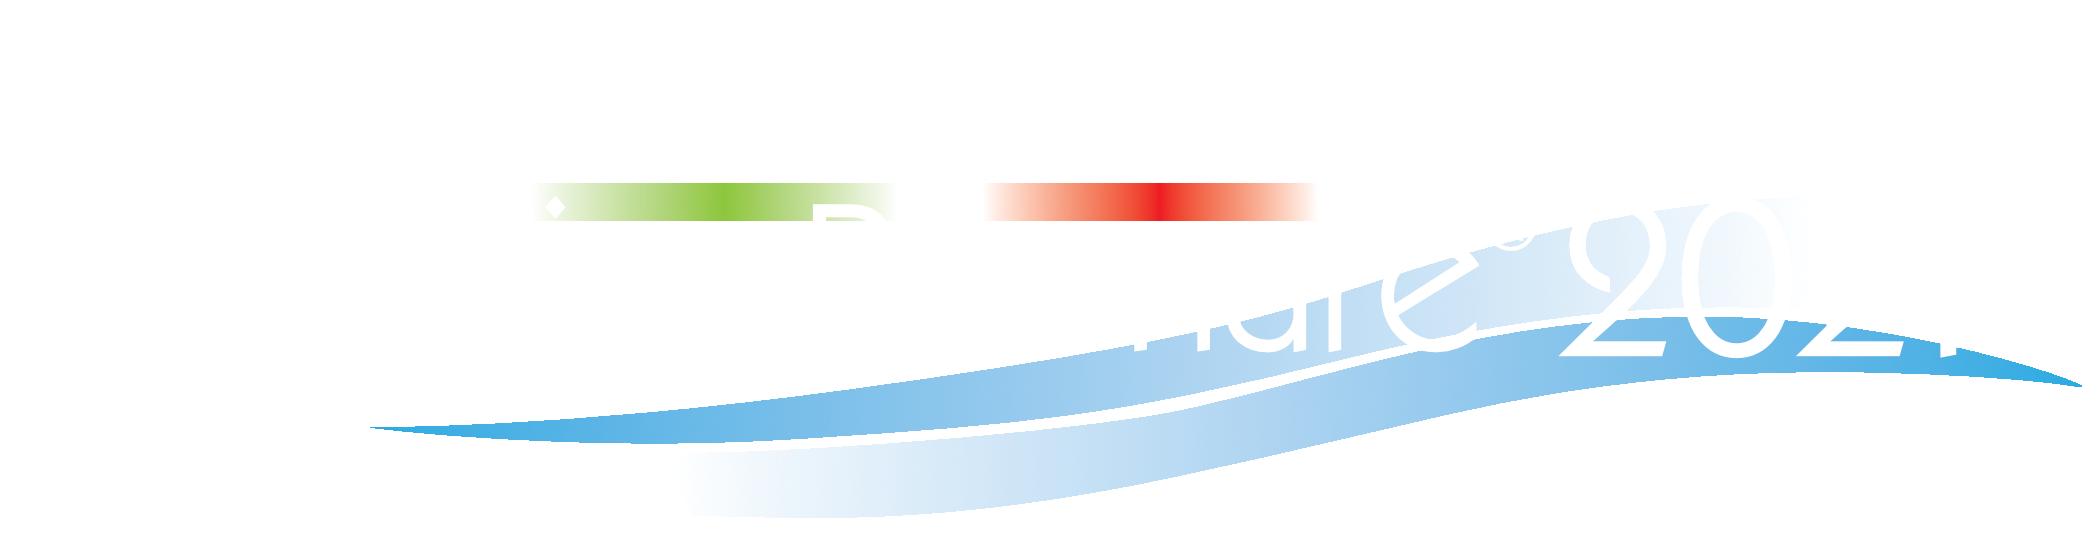 Miss Blumare 2021 logo